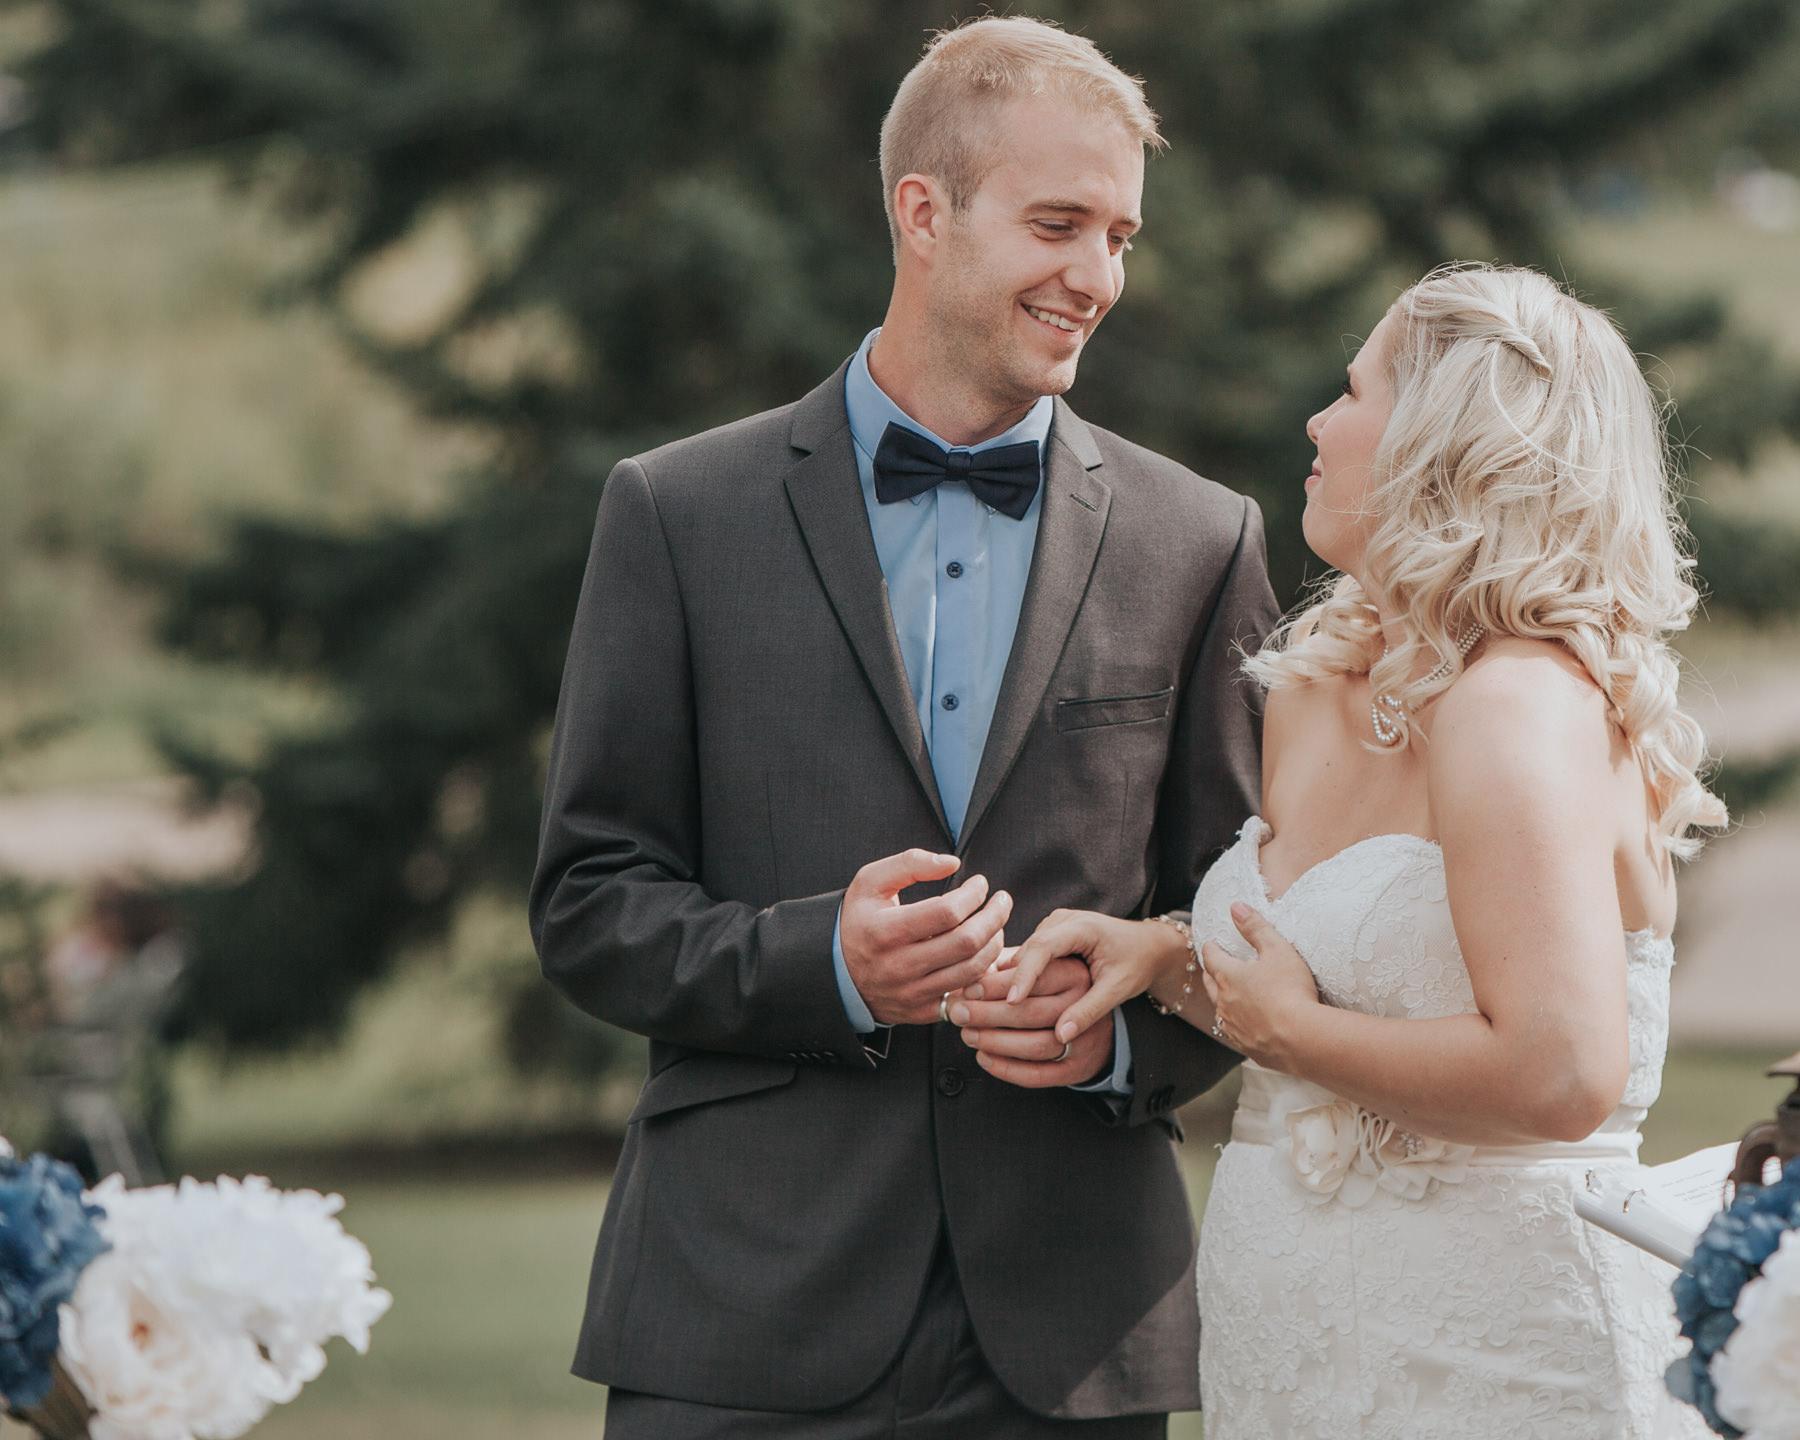 Vancouver wedding photographer Jess 17